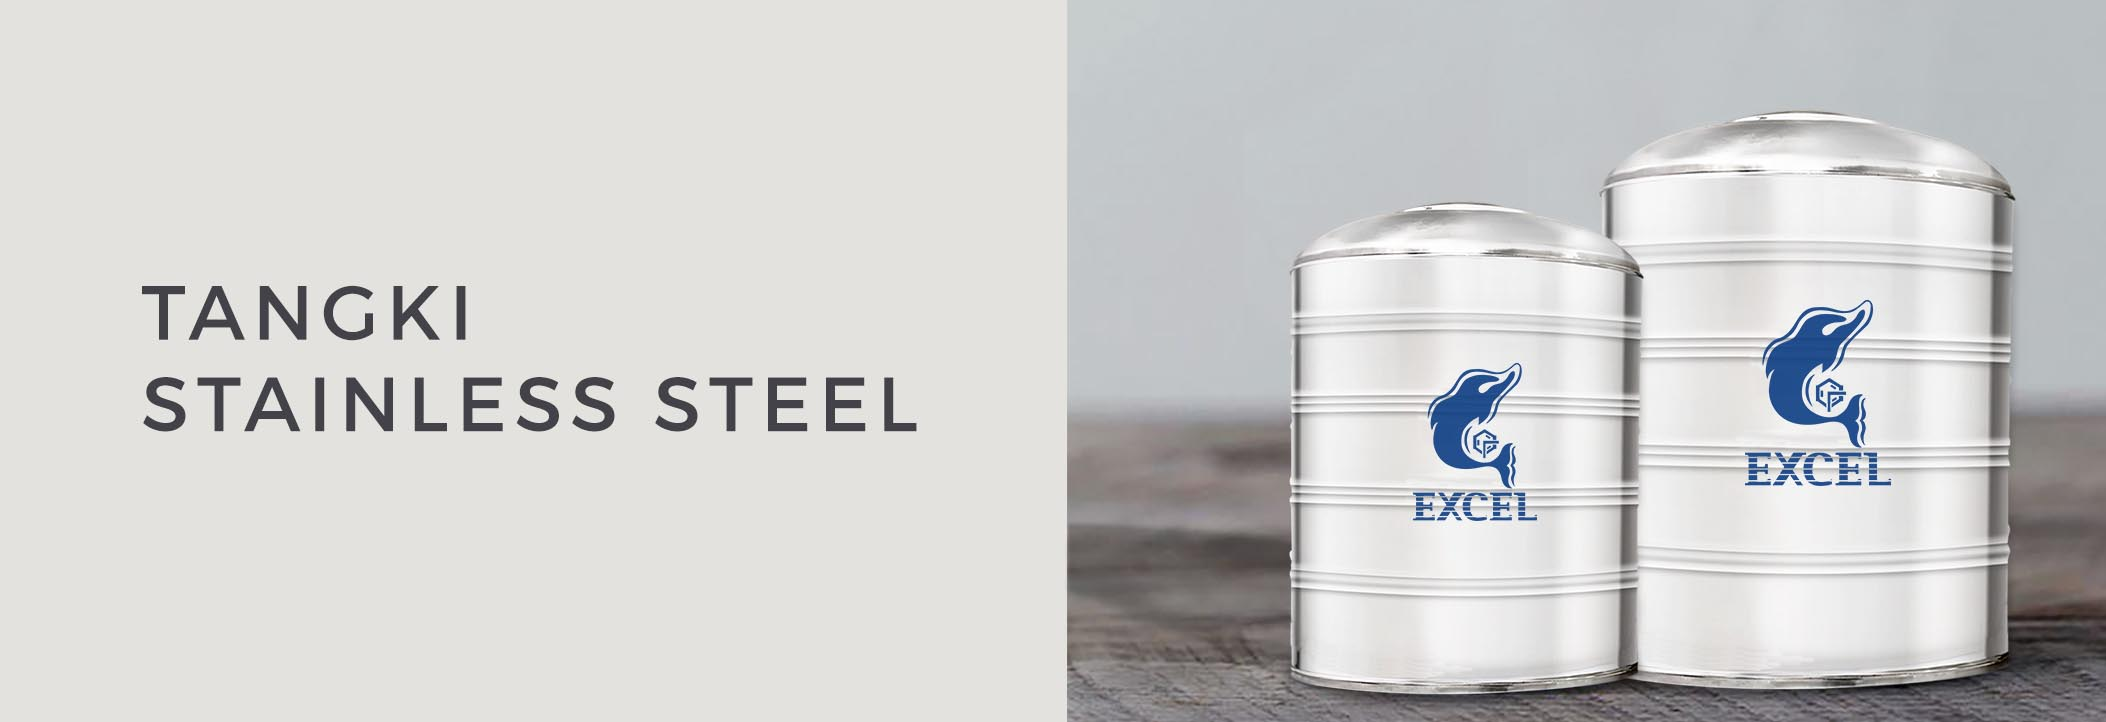 Foto Tangki Air Stainless Steel